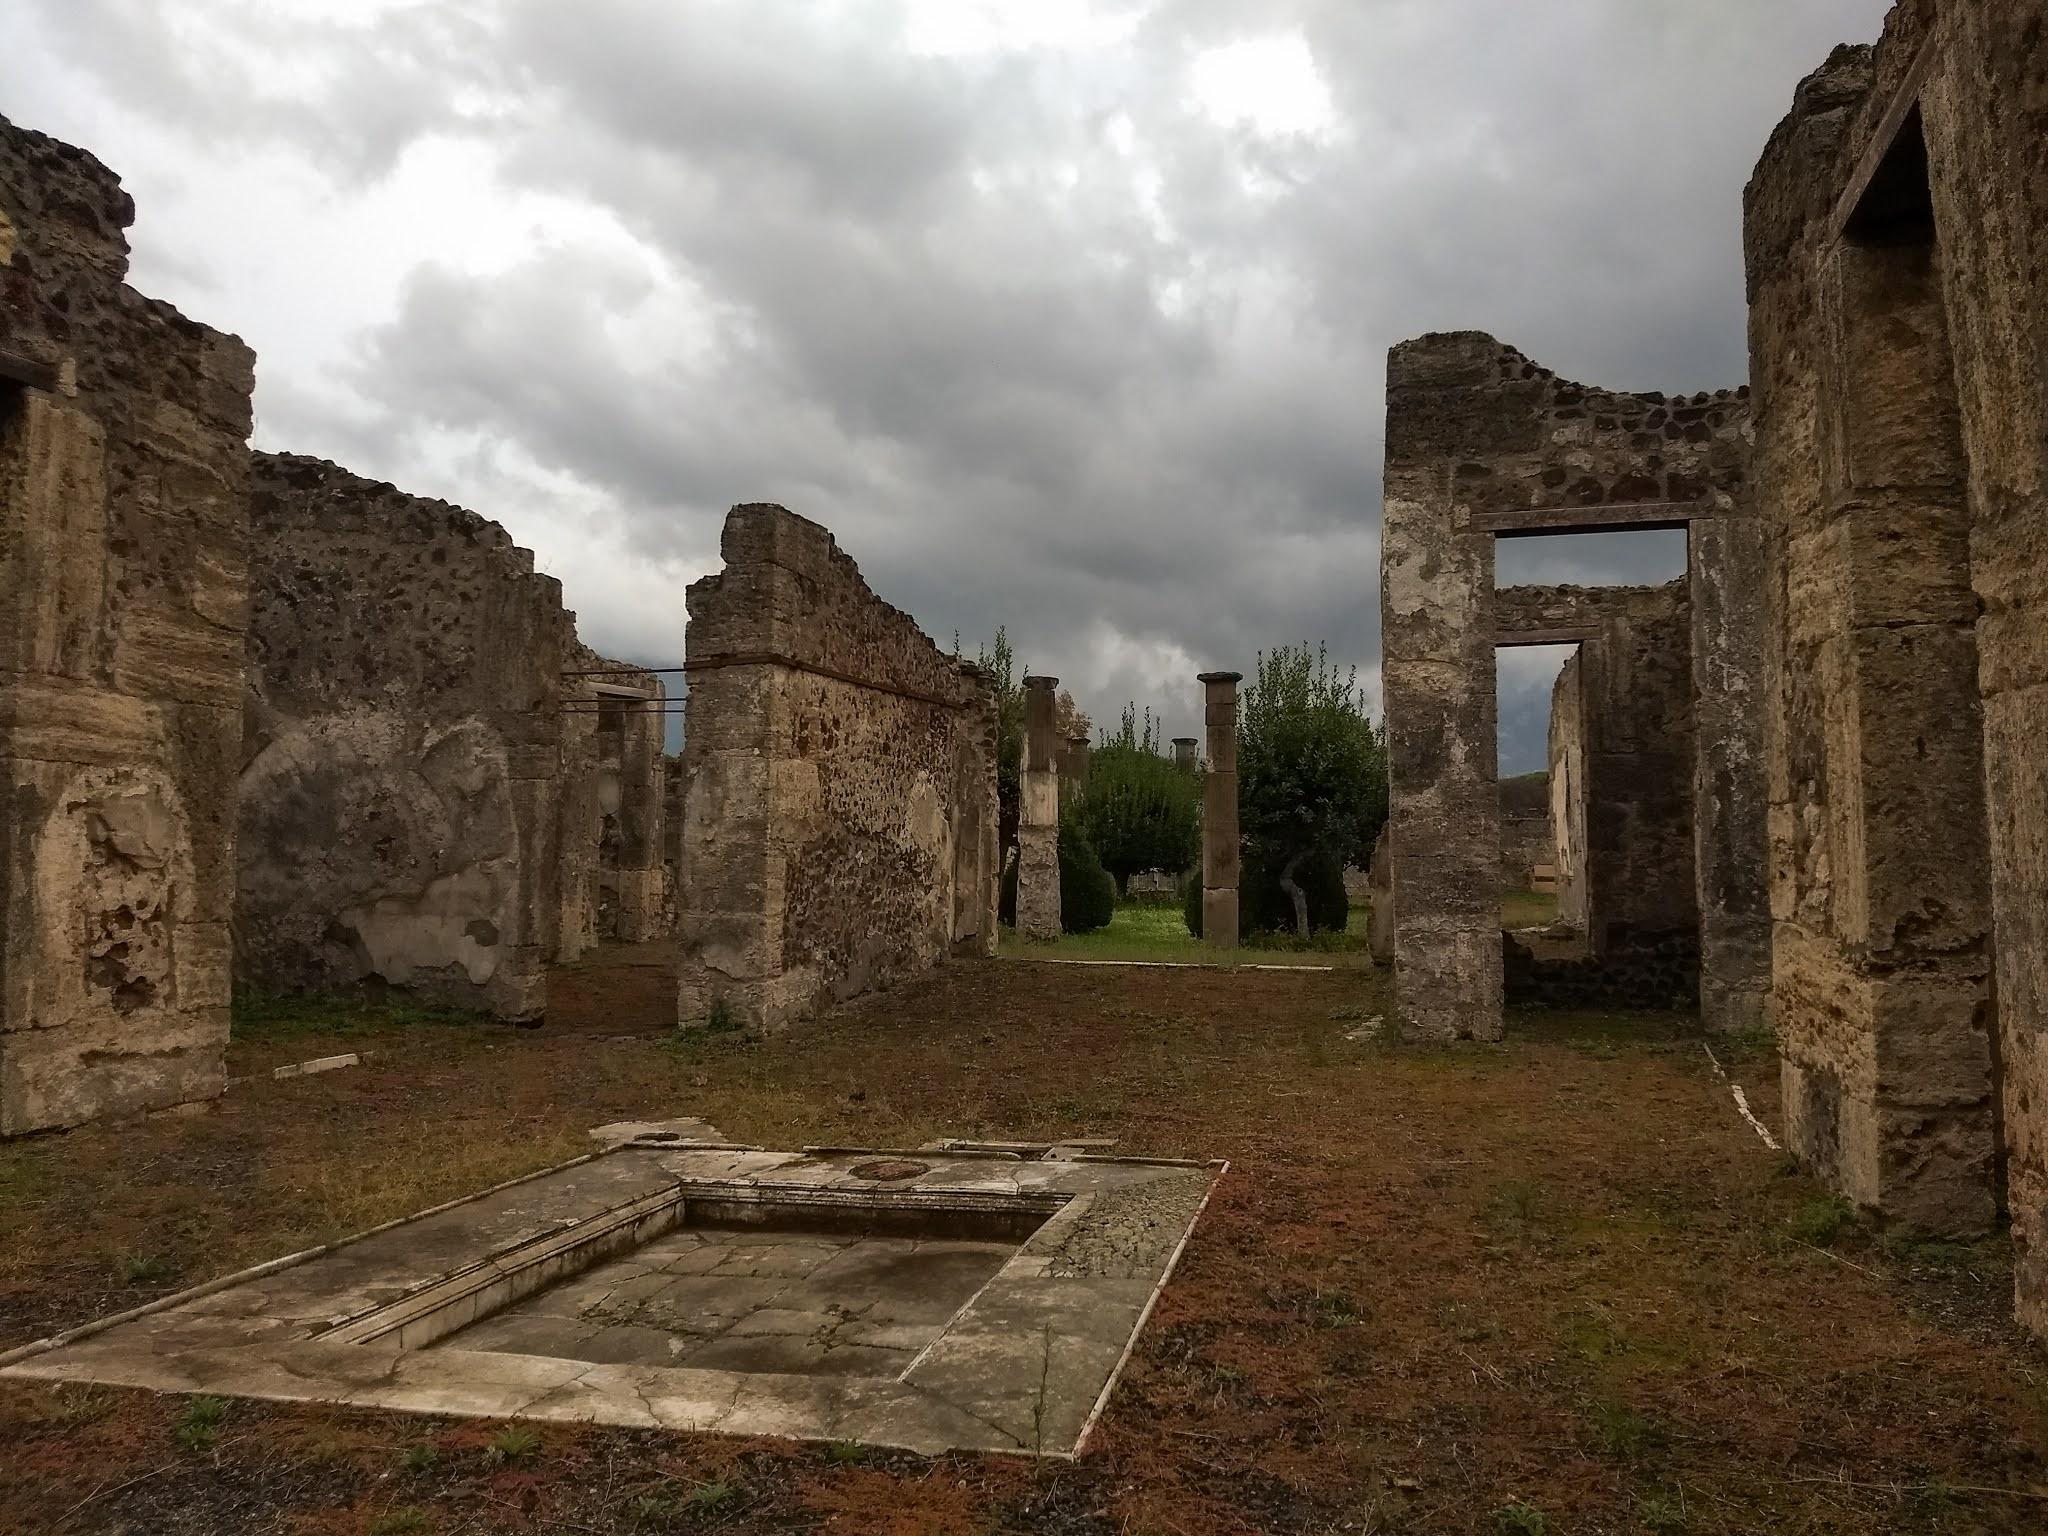 The House of Cornelius Rufus in the historic site of Pompeii.